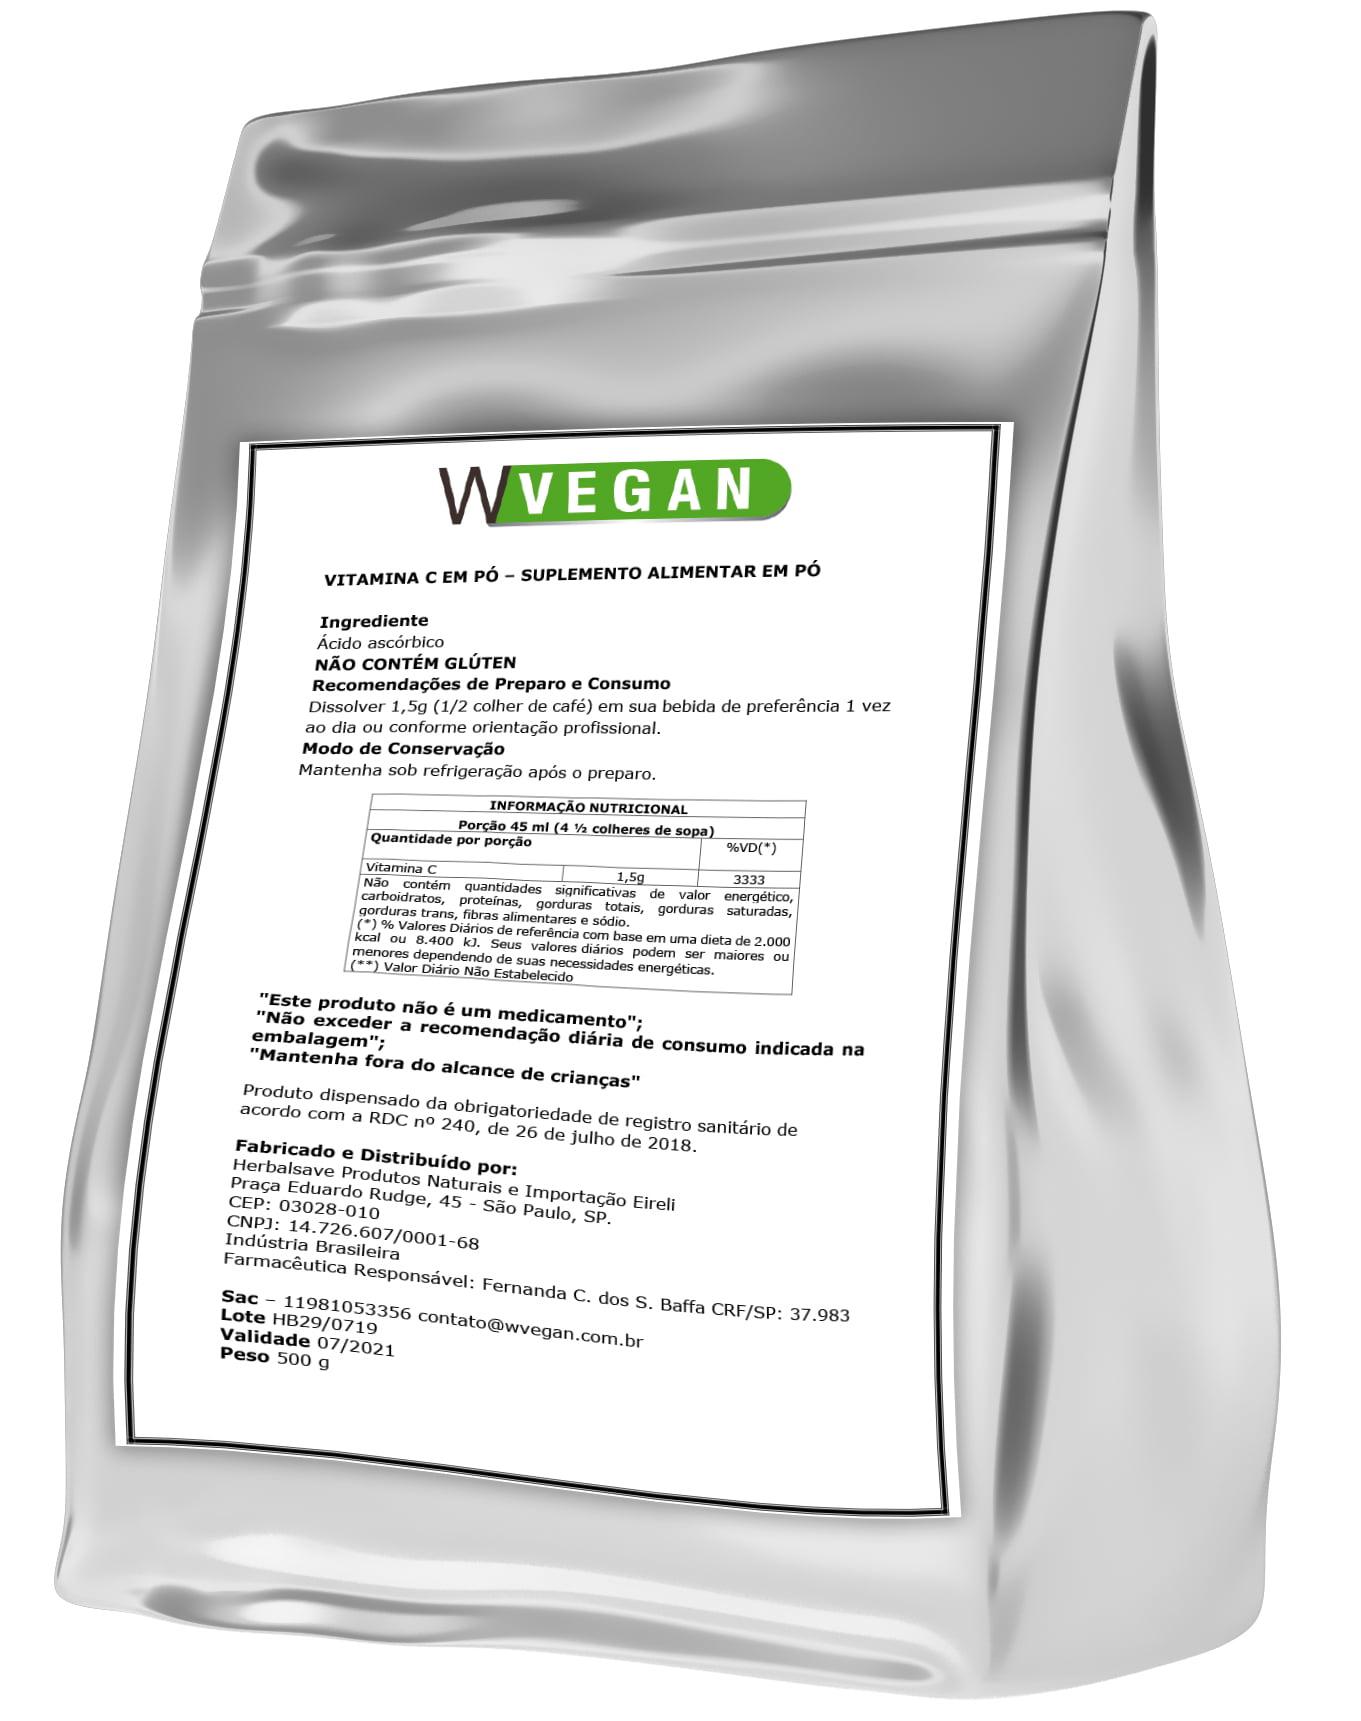 Vitamina C Ácido Ascórbico 500g 500 gramas Embalagem Refil WVegan